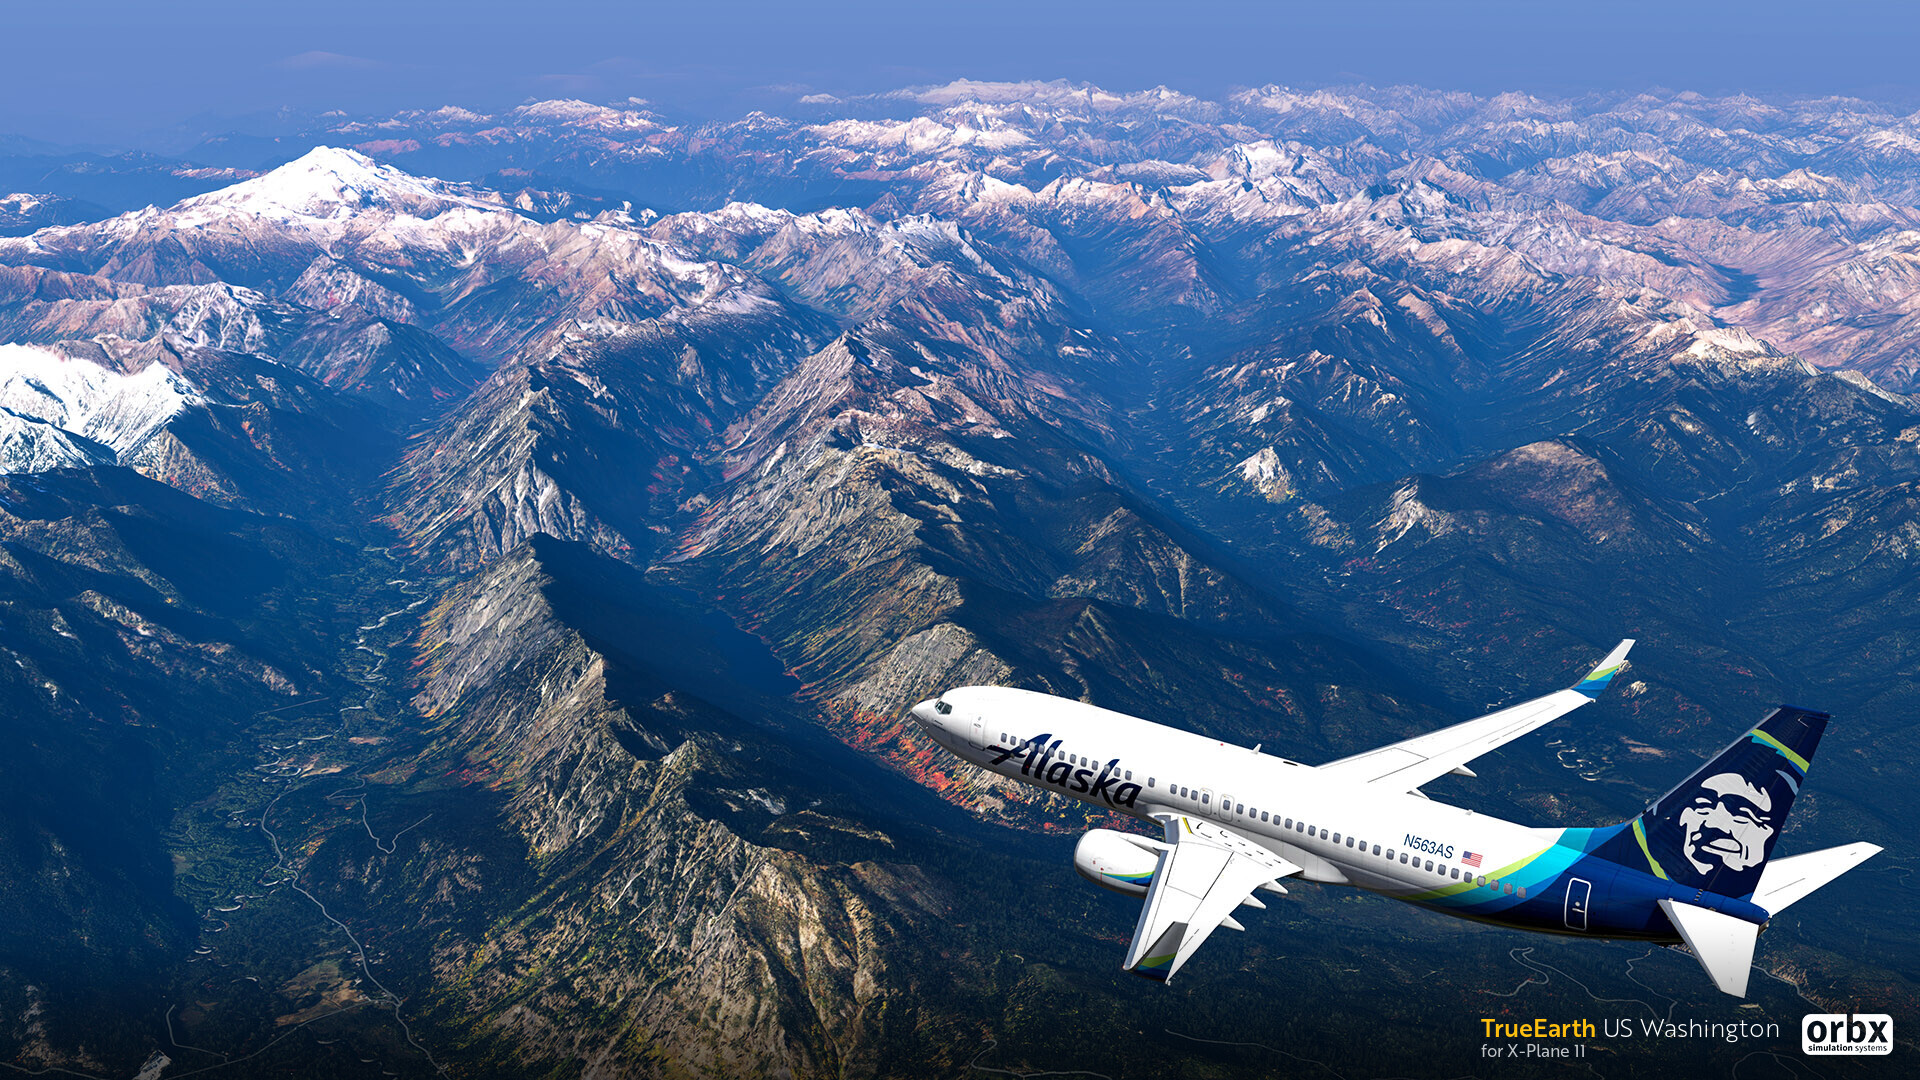 TrueEarth US Washington HD - X-Plane 11